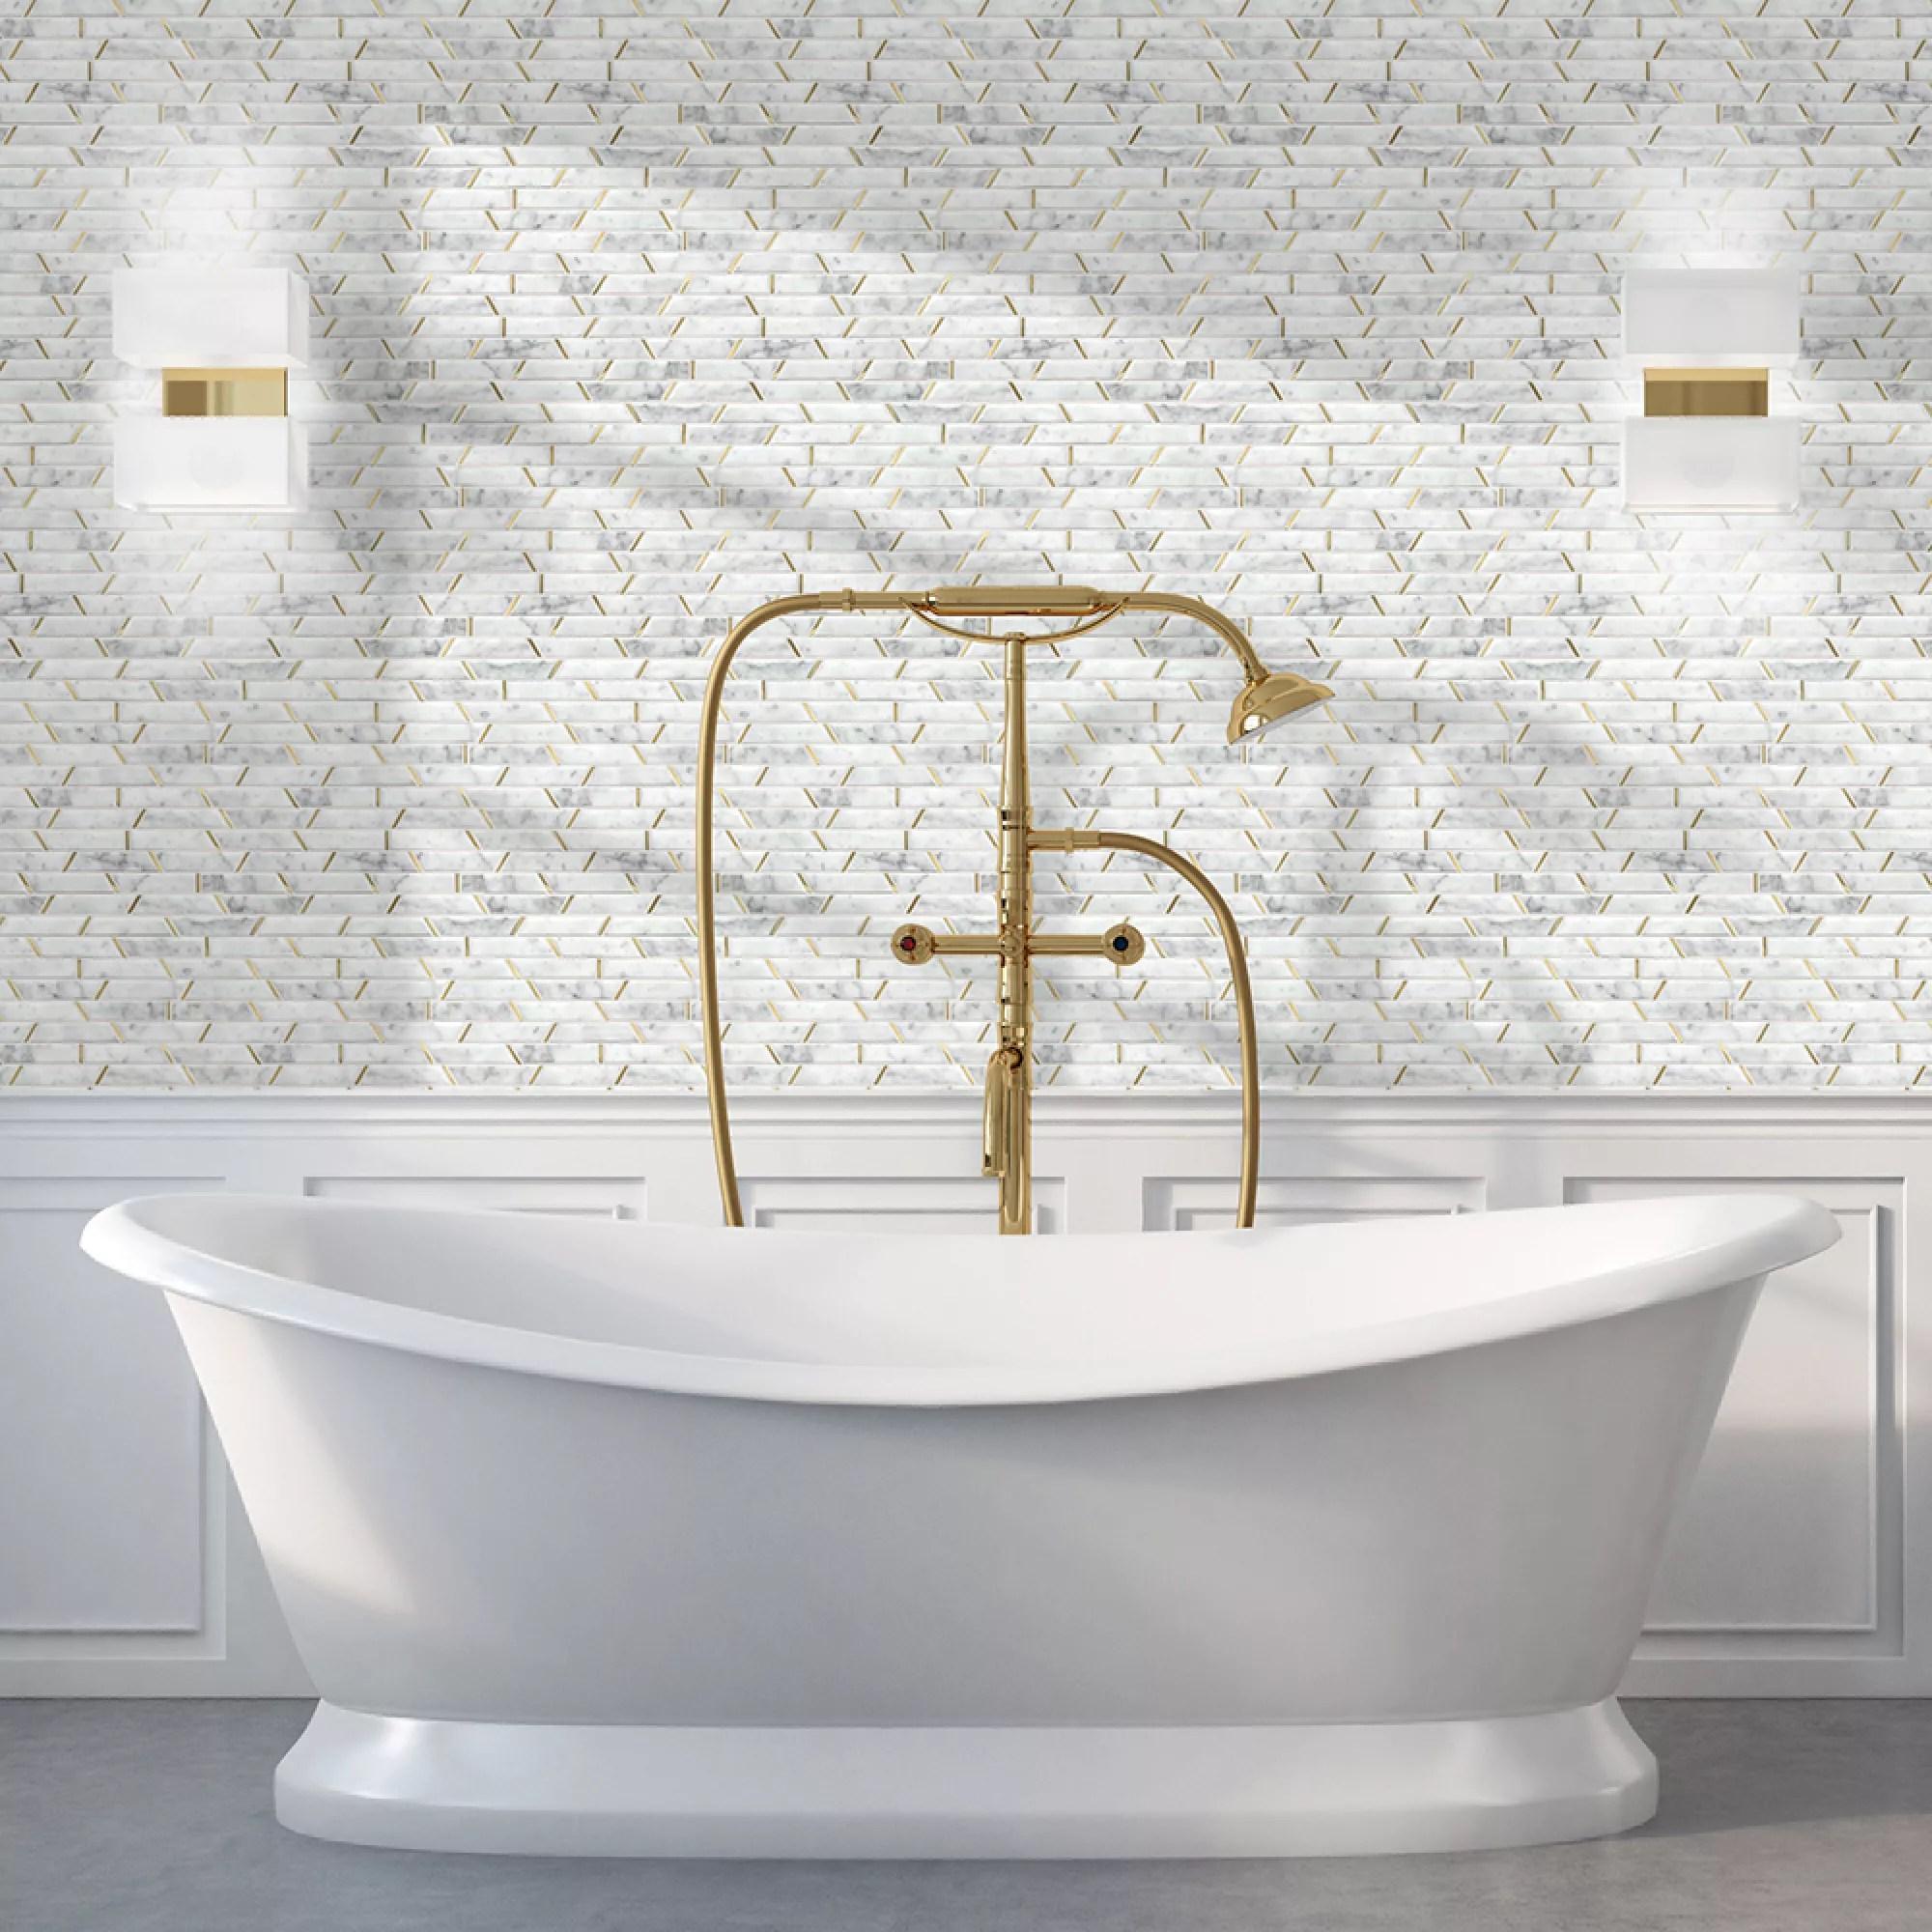 monte carlo white brass effect marble mosaic tile l 300mm w 350mm